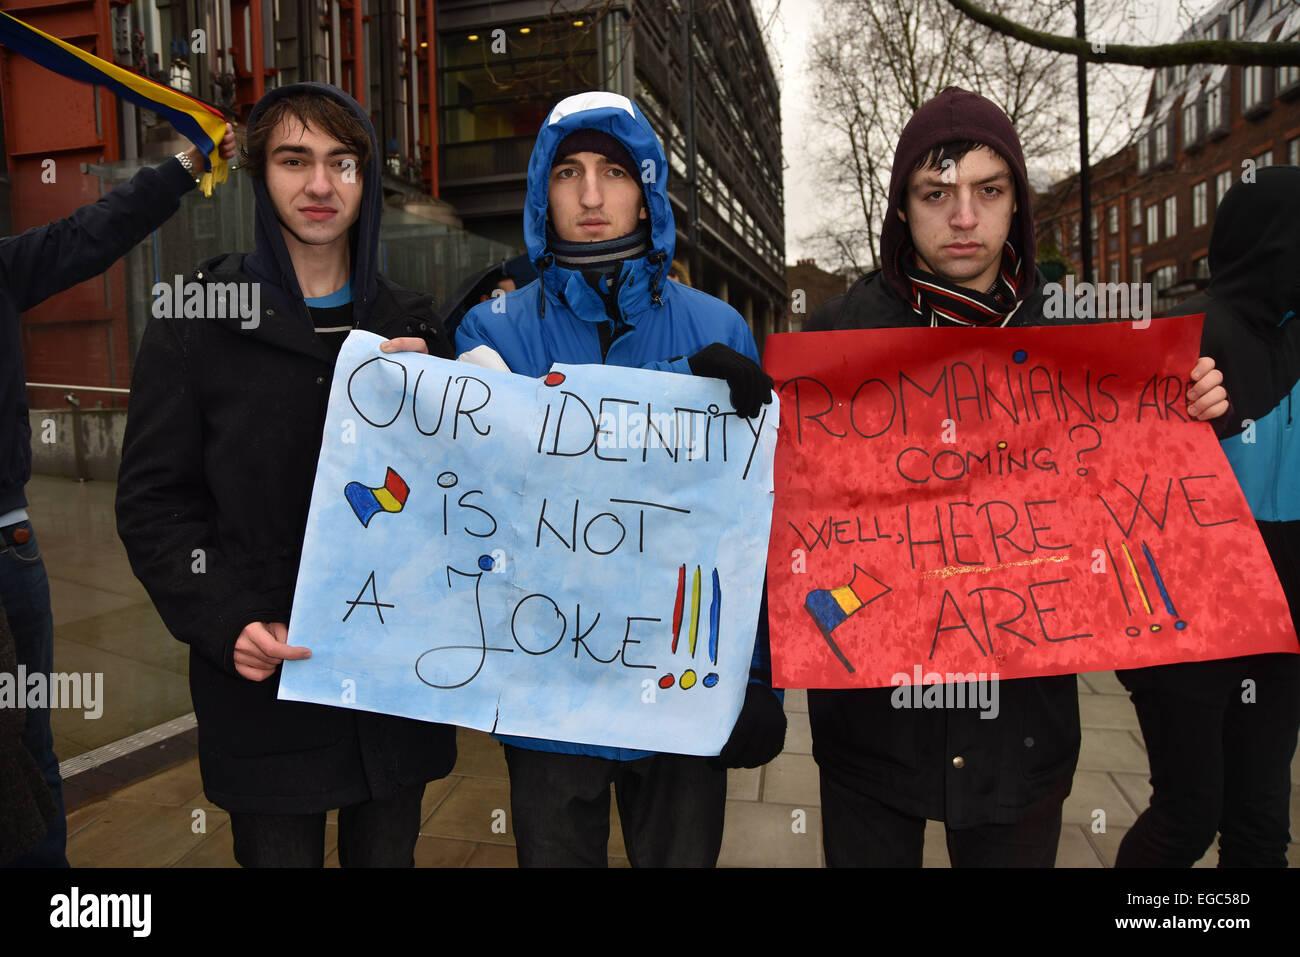 London, UK. 22nd February, 2015. A group of ordinary